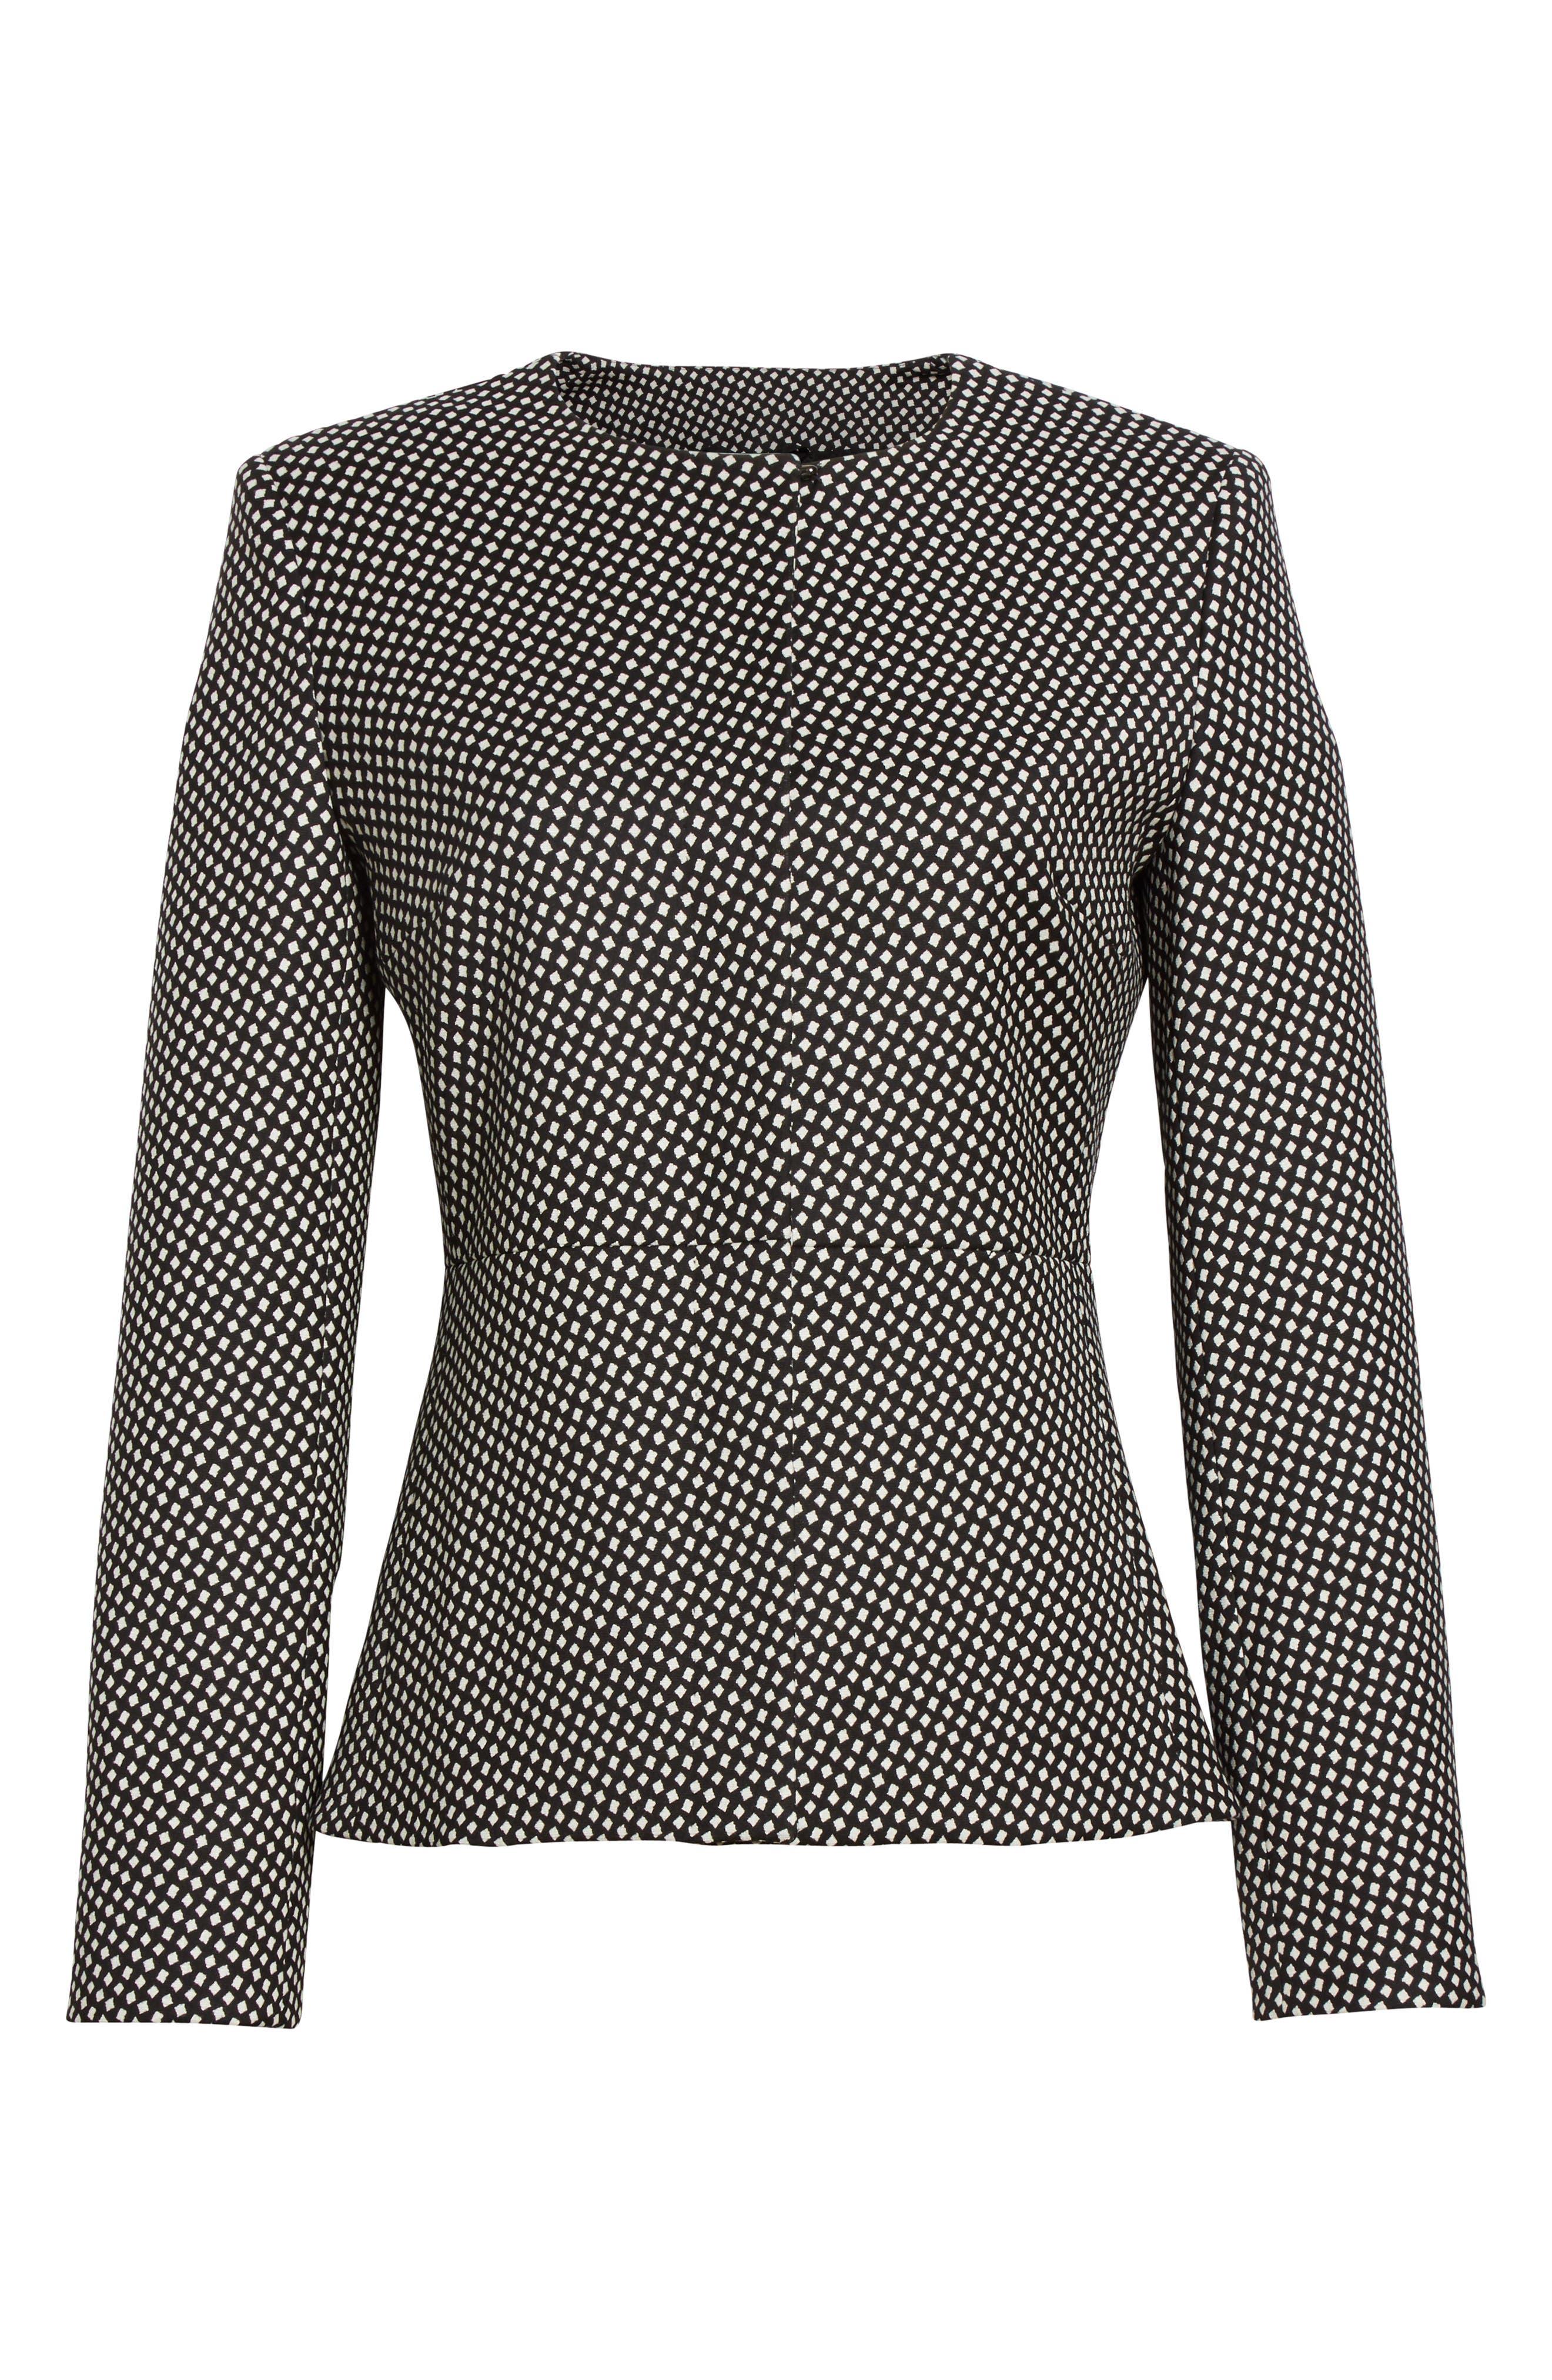 Ajaccio Wool Blend Jacquard Jacket,                             Alternate thumbnail 5, color,                             001